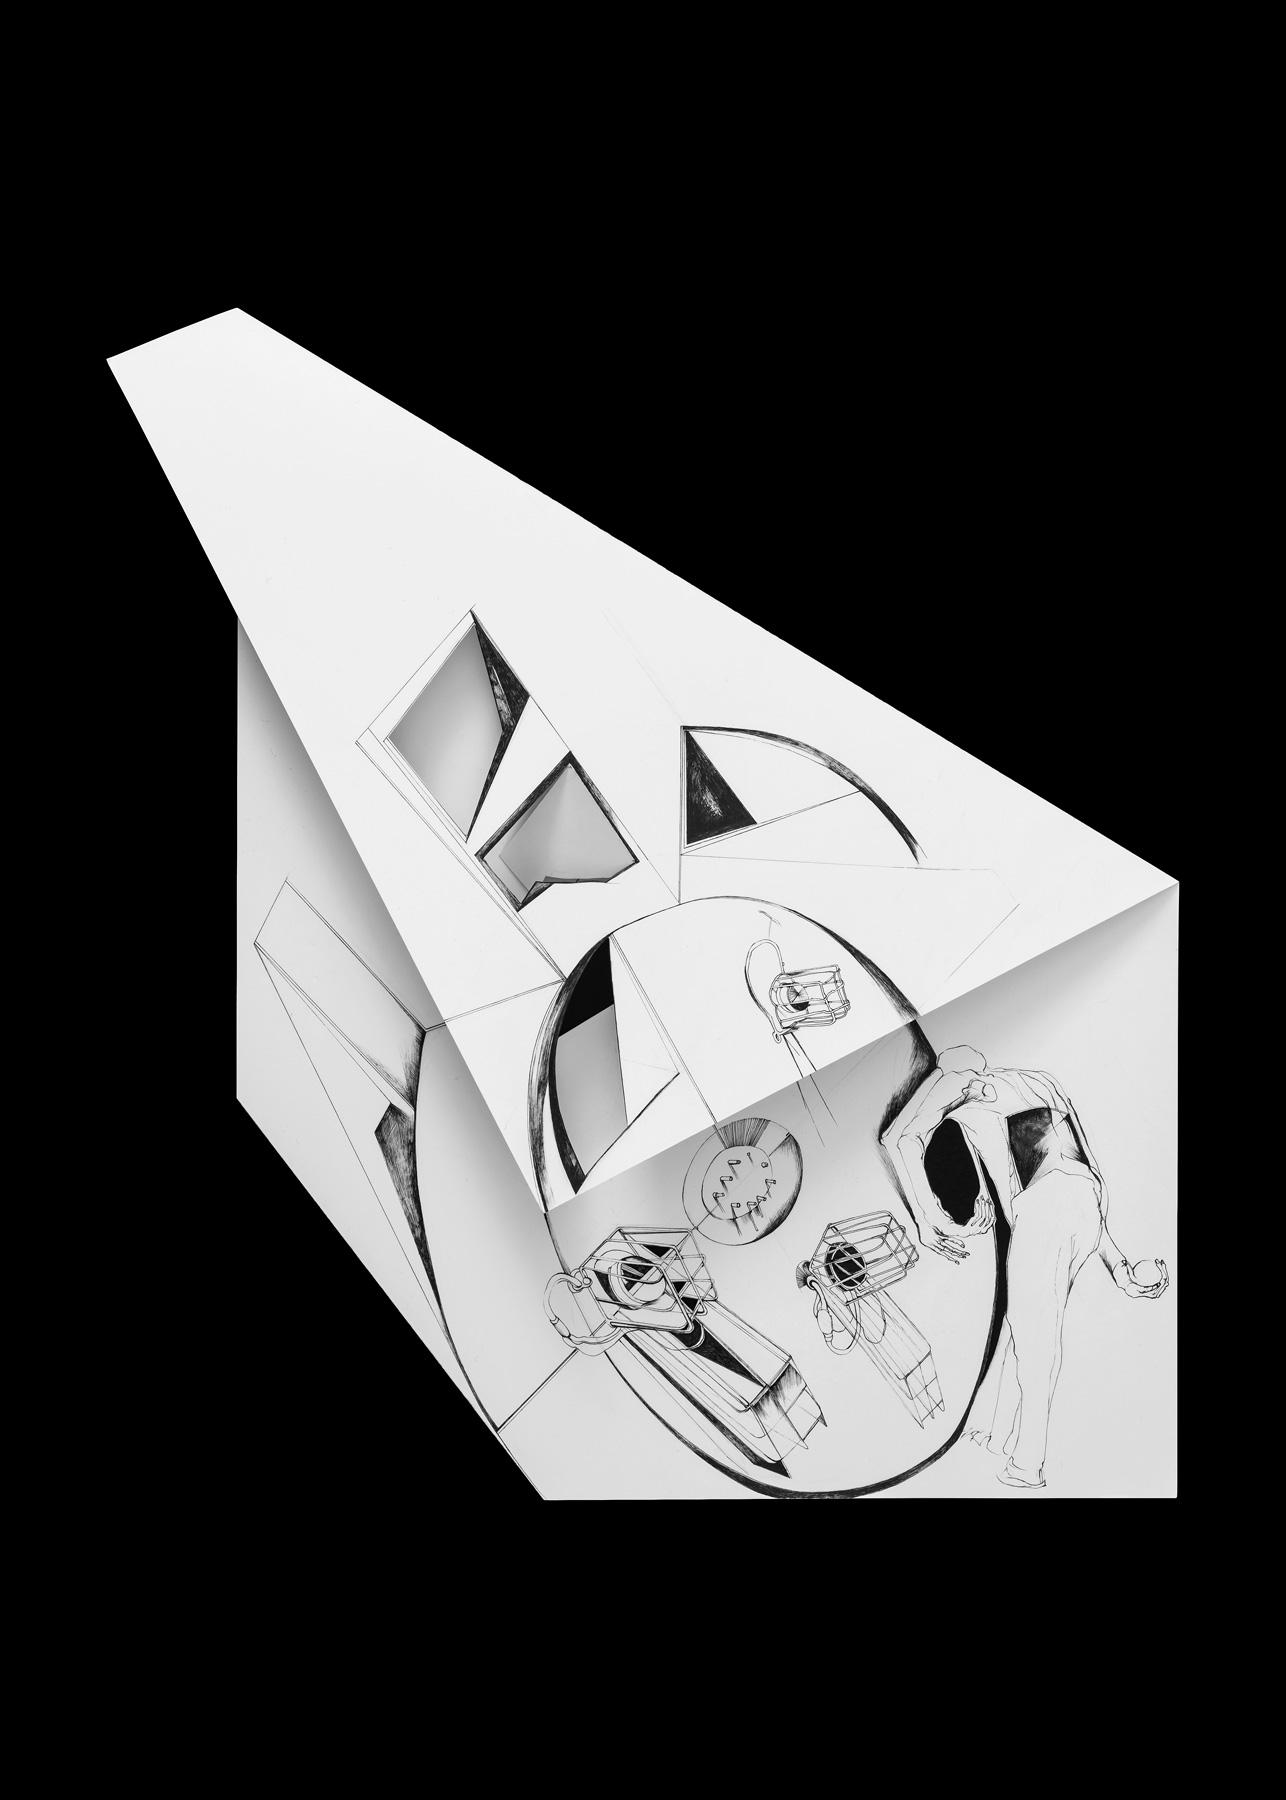 Nina Annabelle Märkl | Fragmented fiction 15 | Ink on folded paper, cut-outs | 54 x 34 cm | 2016